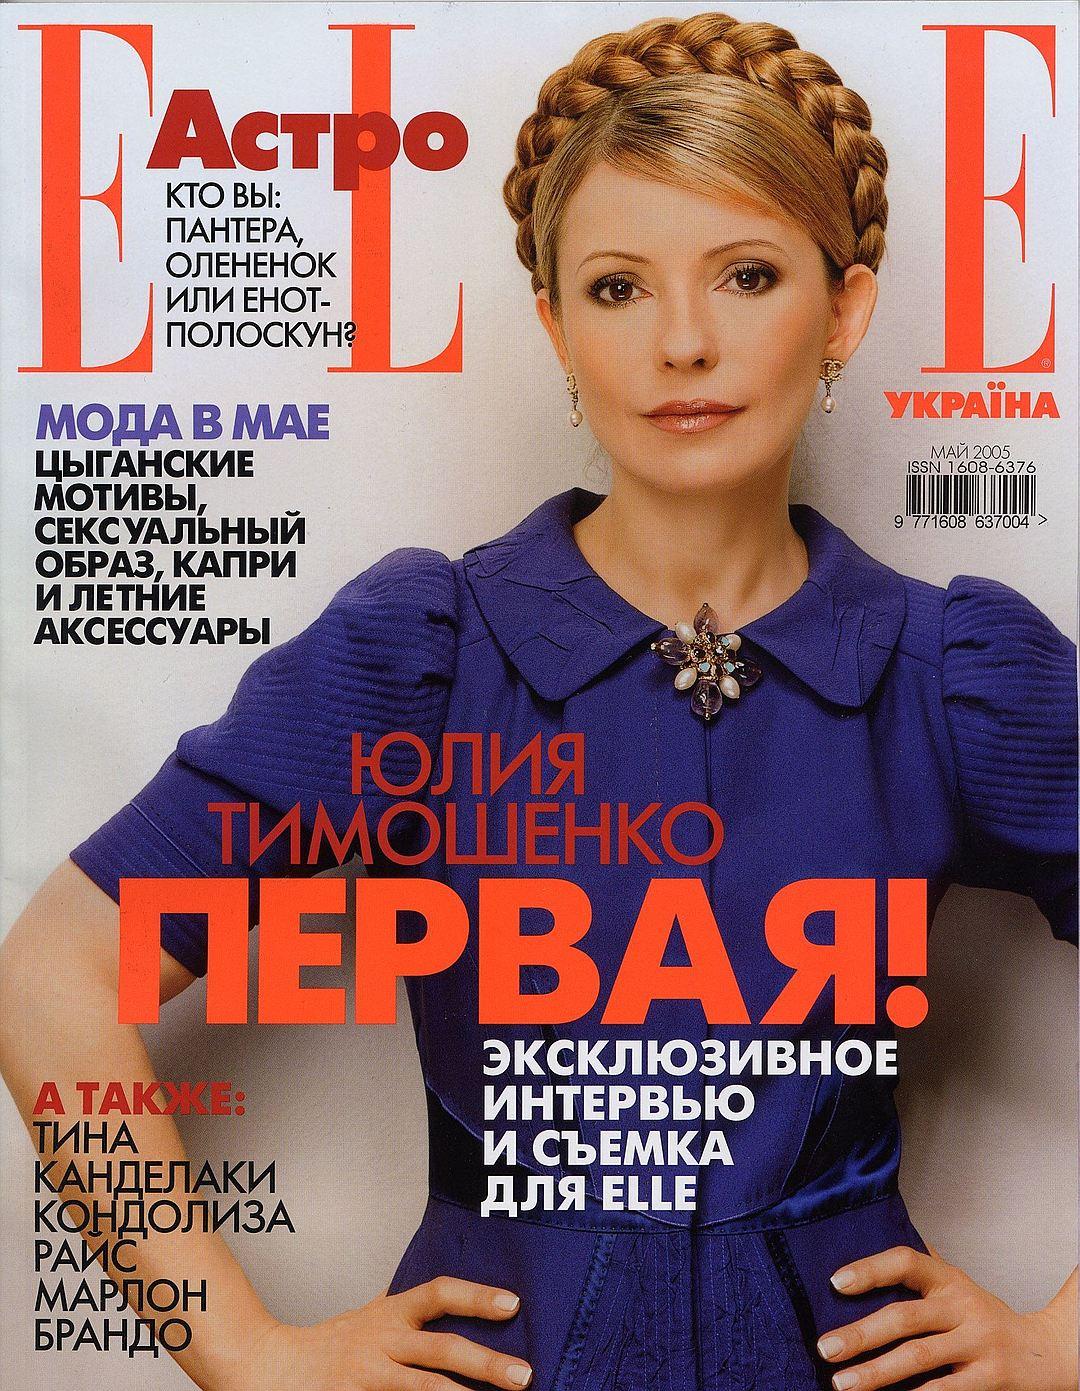 Обложка журнала Elle, май 2005